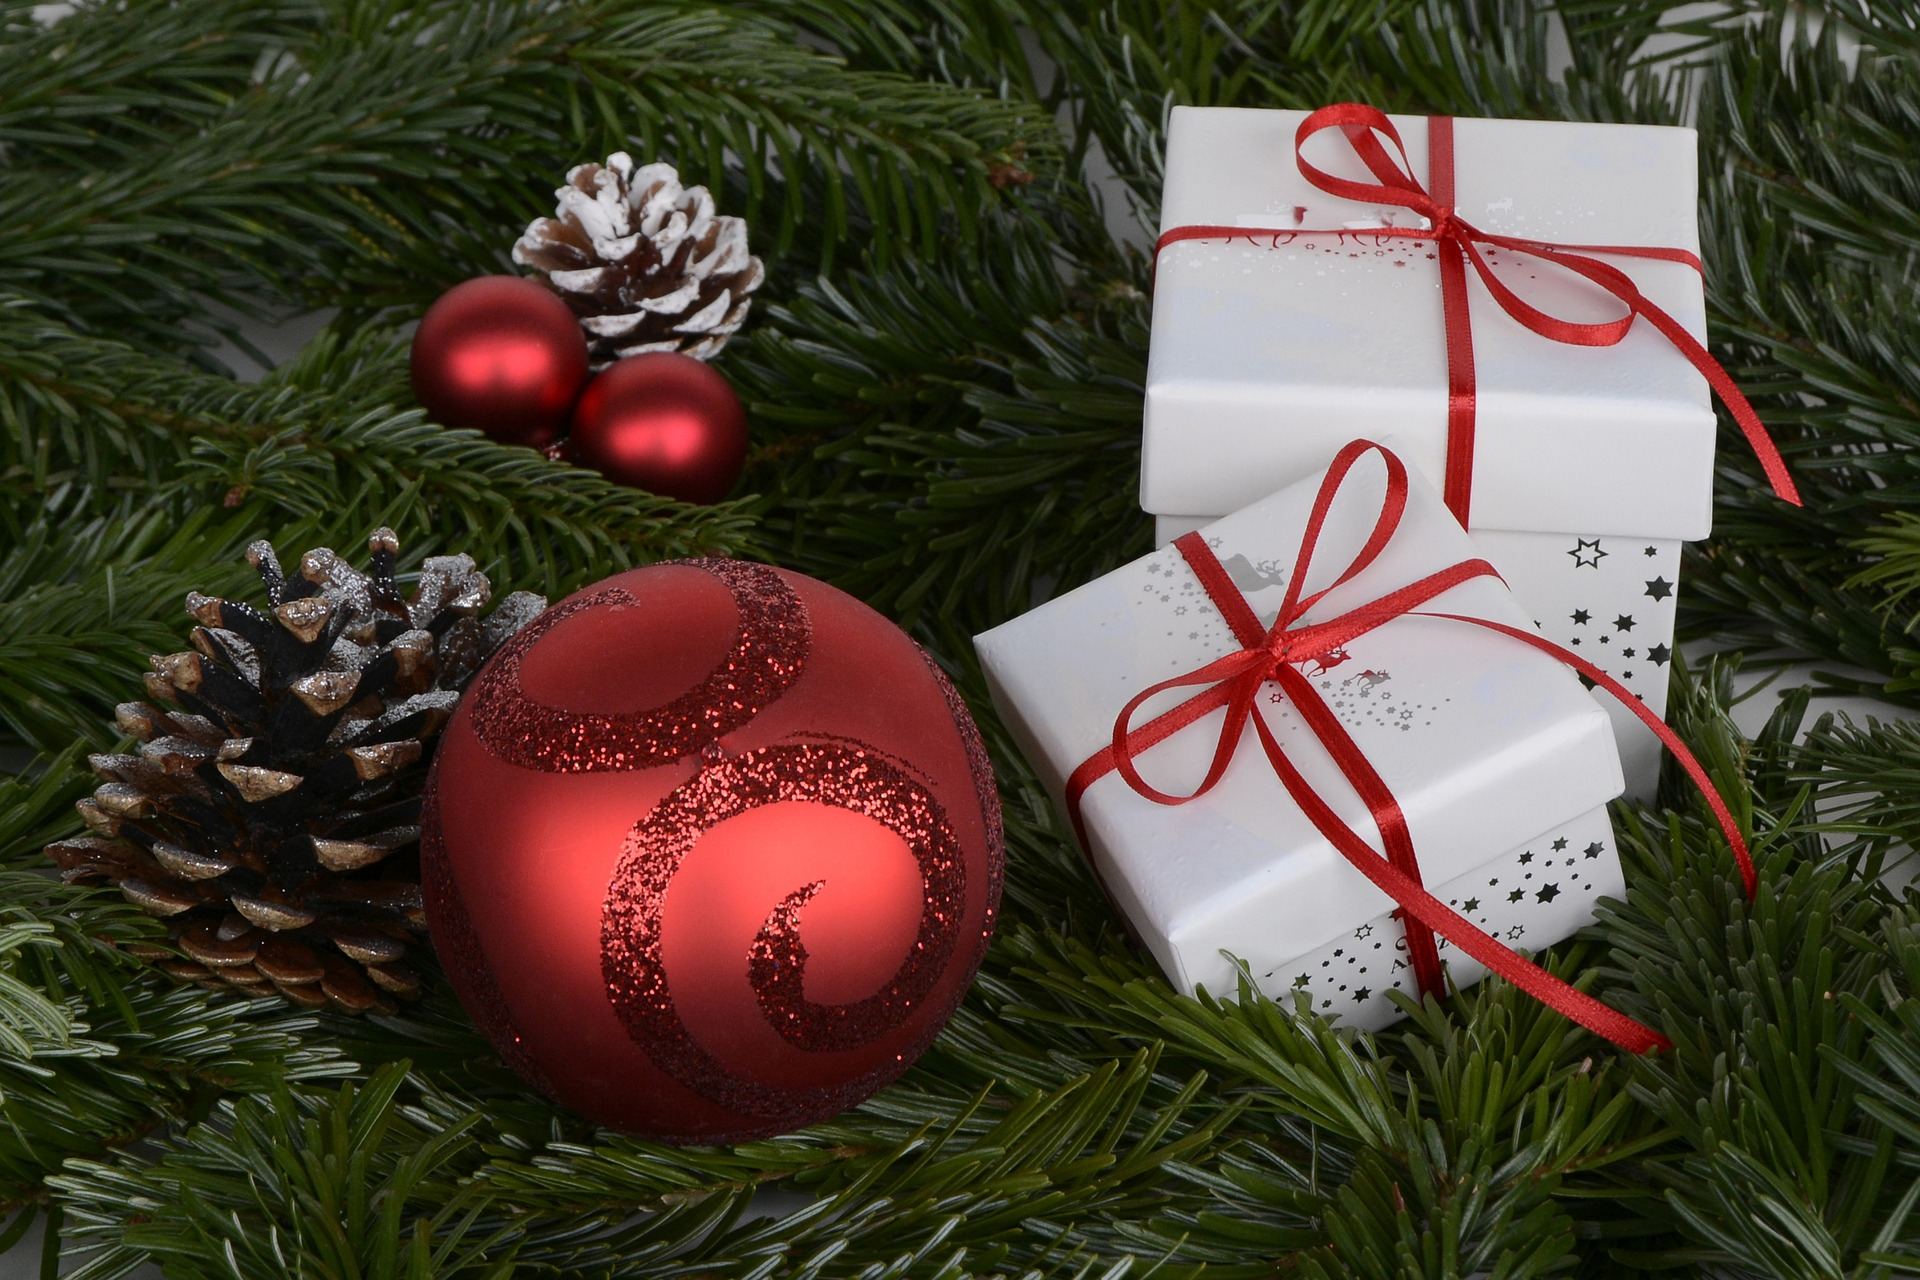 Regali di Natale 2